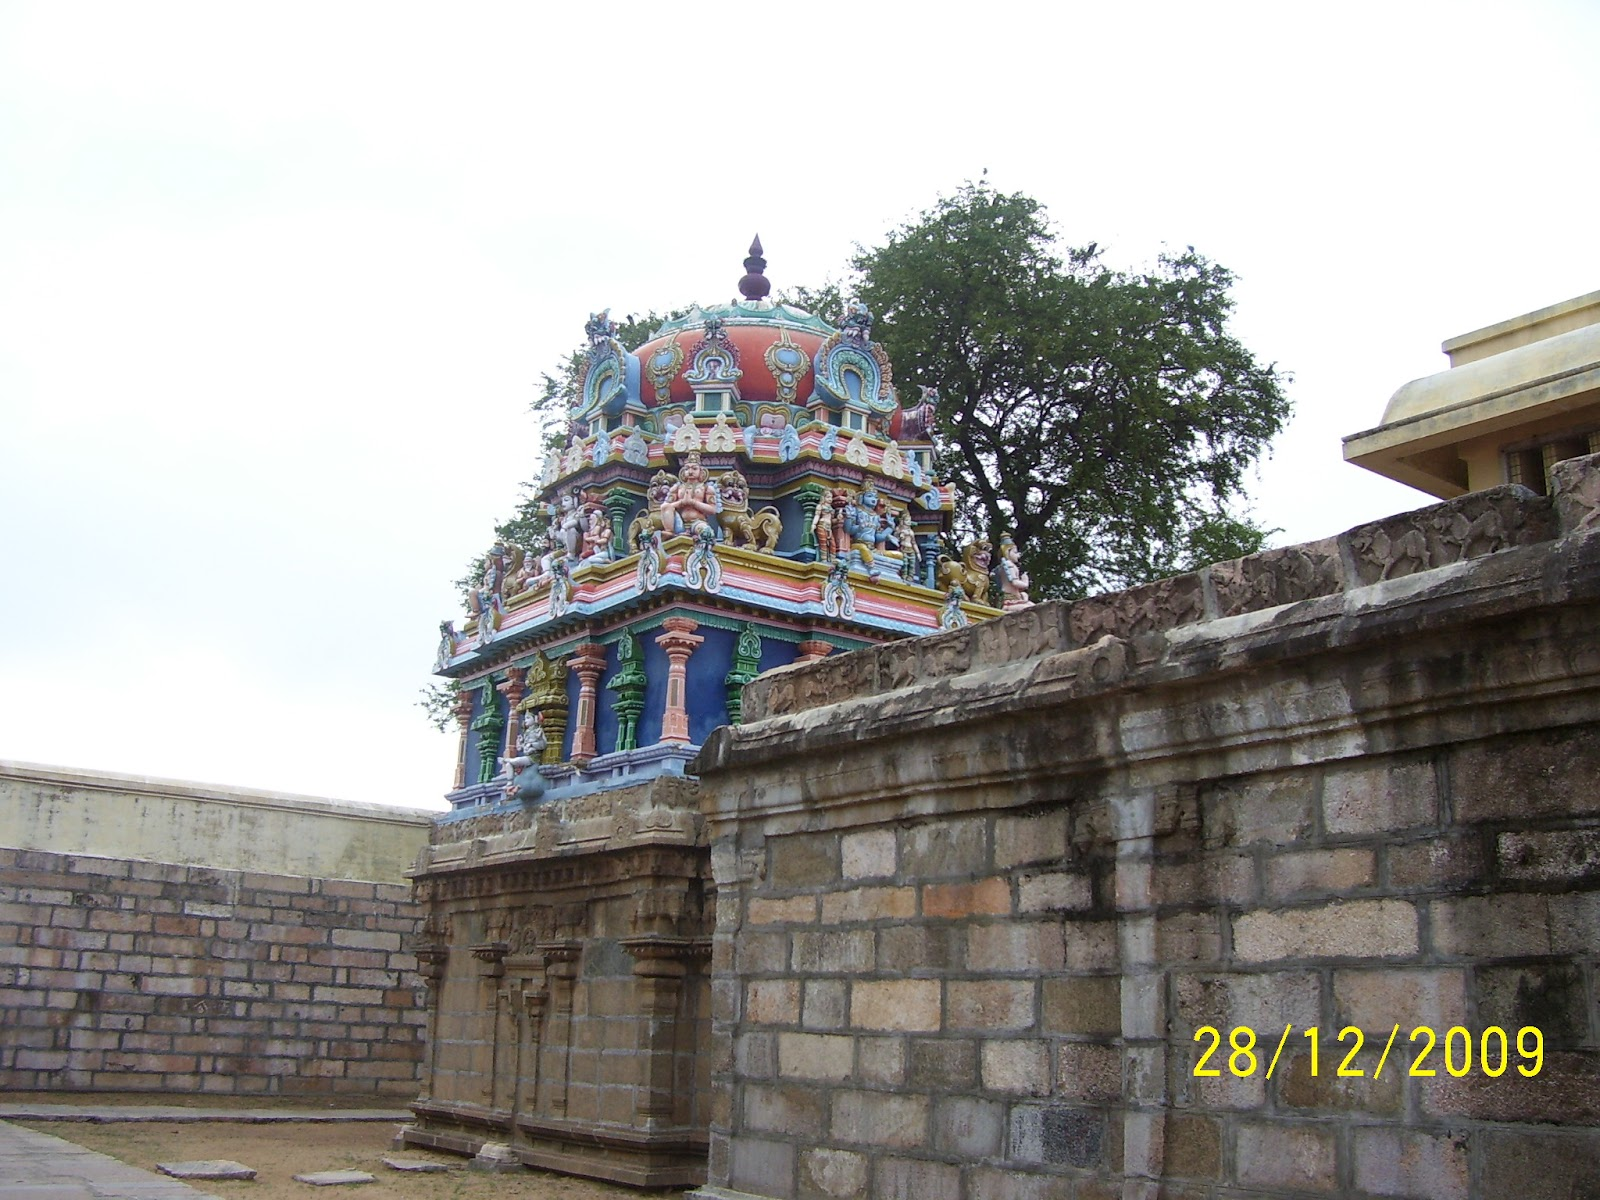 Rettai Tirupathi - Tholaivillimangalam, Nava Tirupathi - Nine Holy Temples